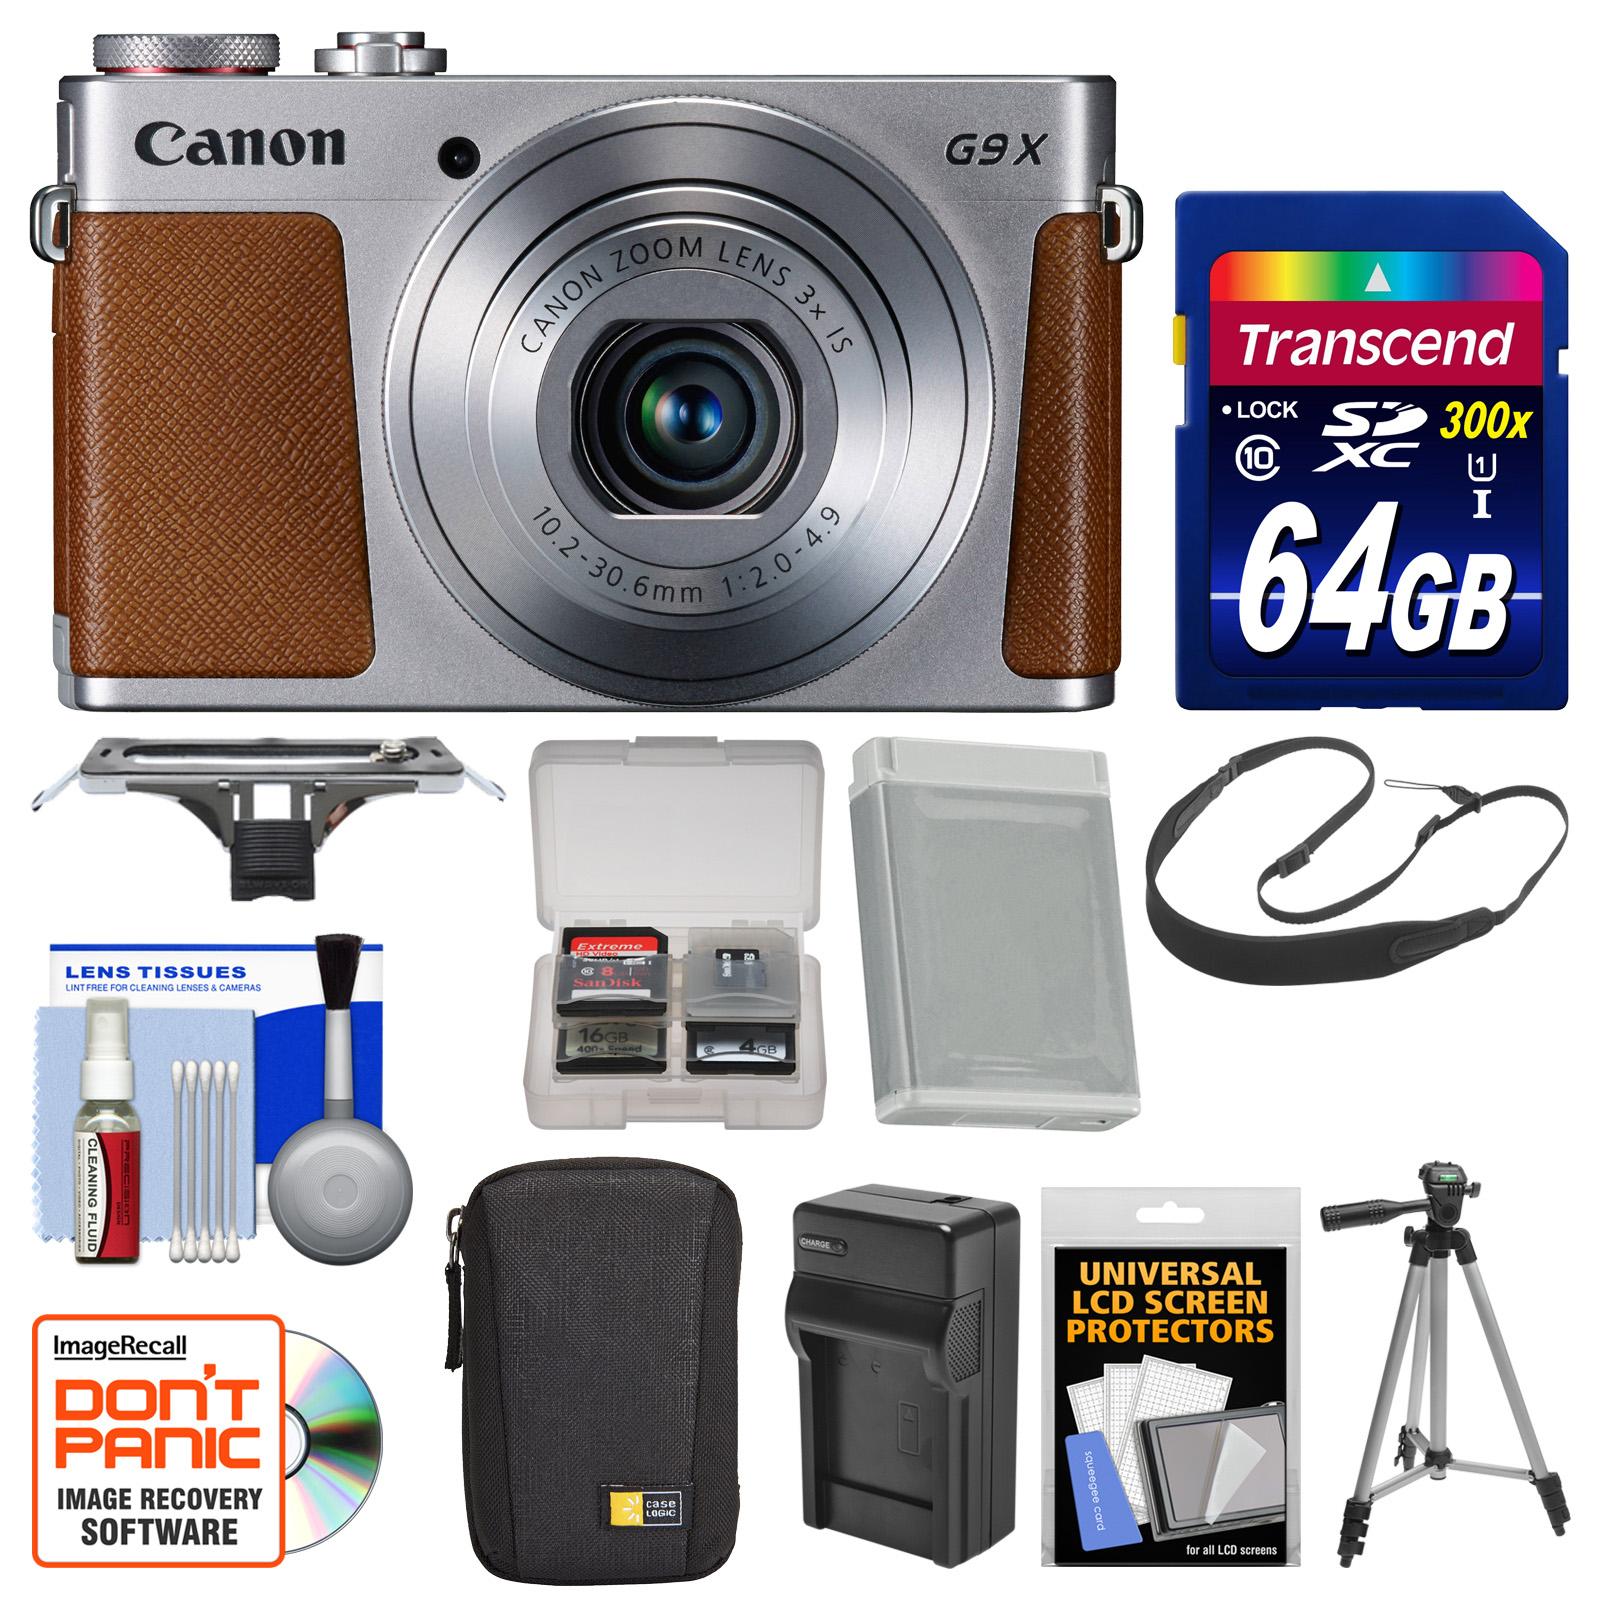 Canon PowerShot G9 X Wi-Fi Digital Camera (Silver) with 6...